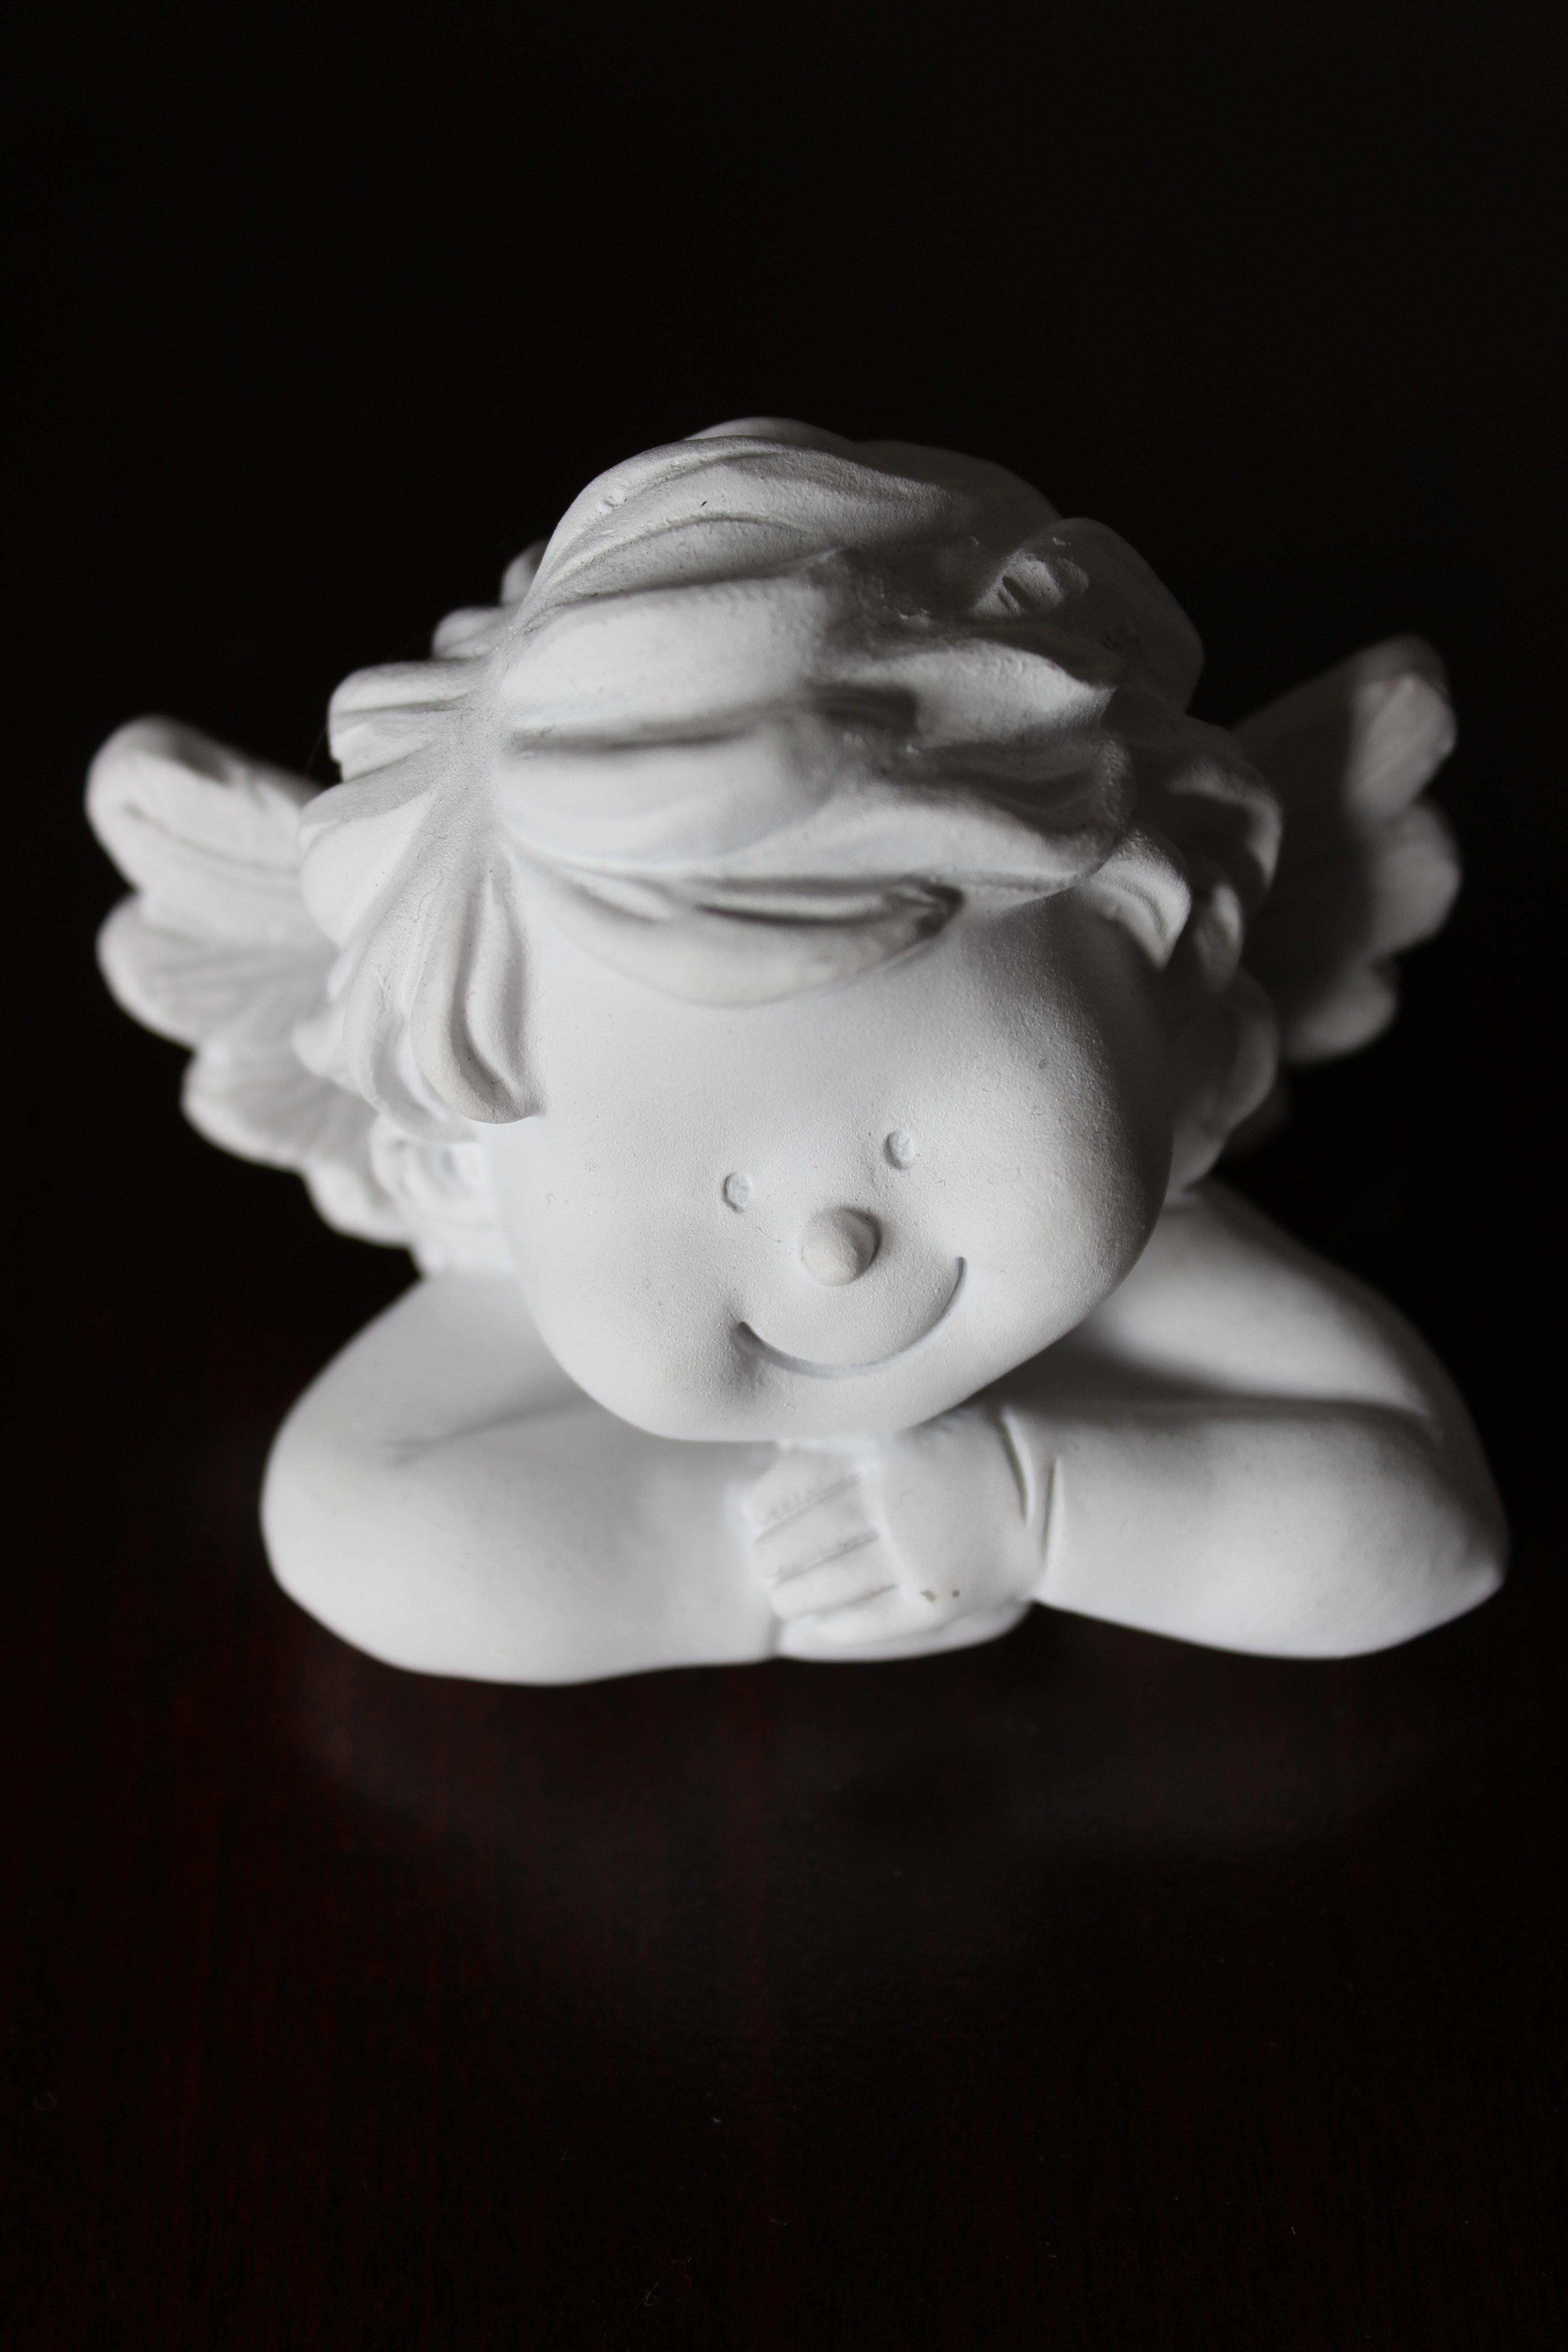 White angel figurine photo